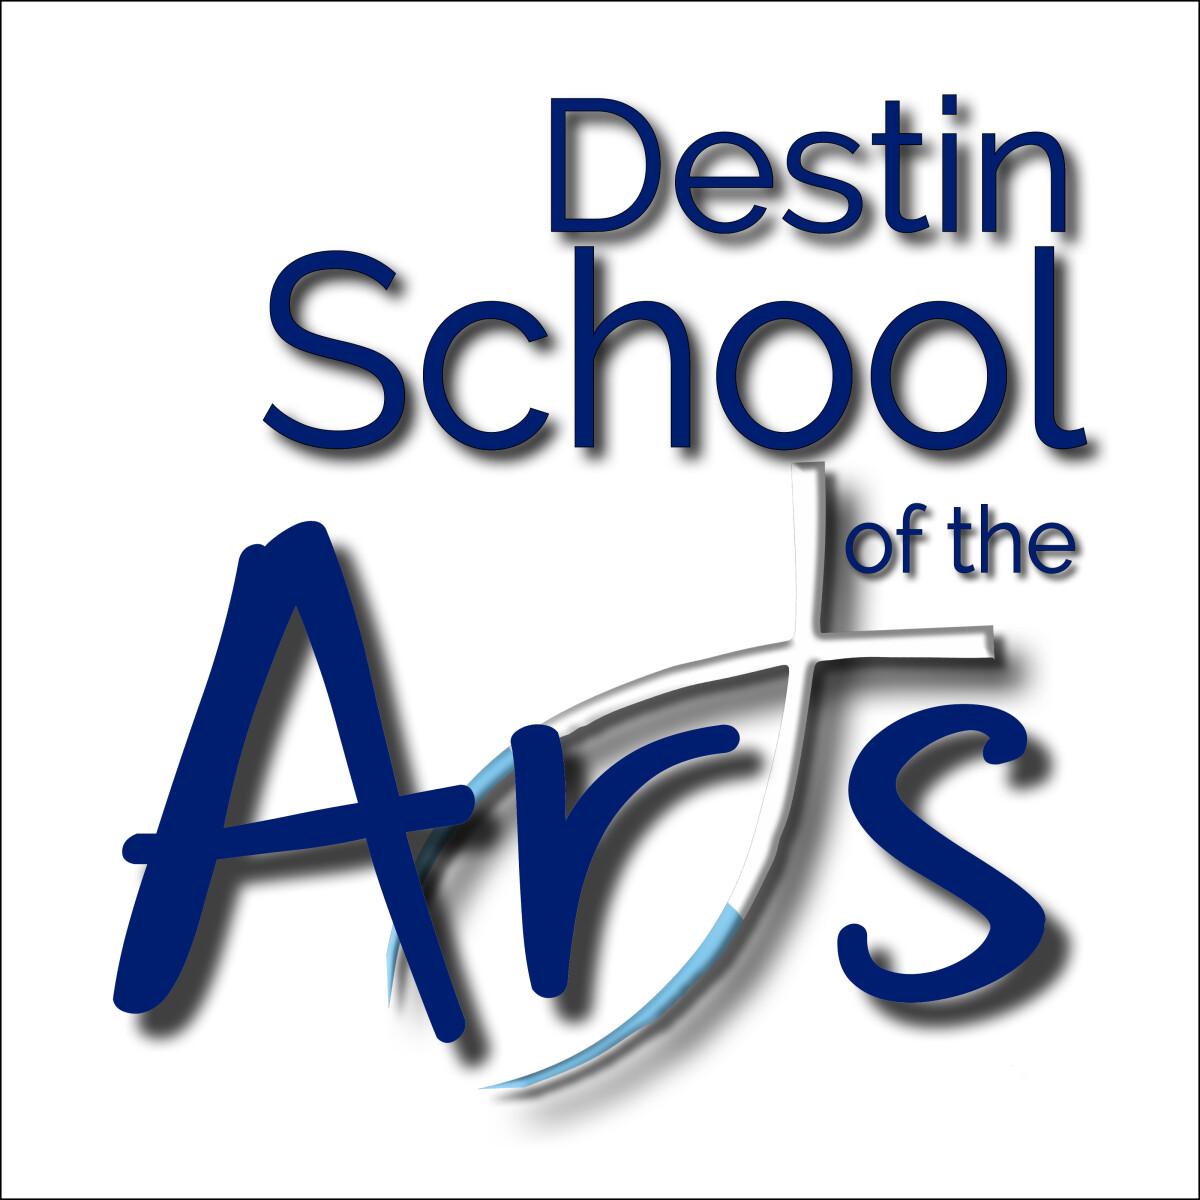 Destin School of the Arts